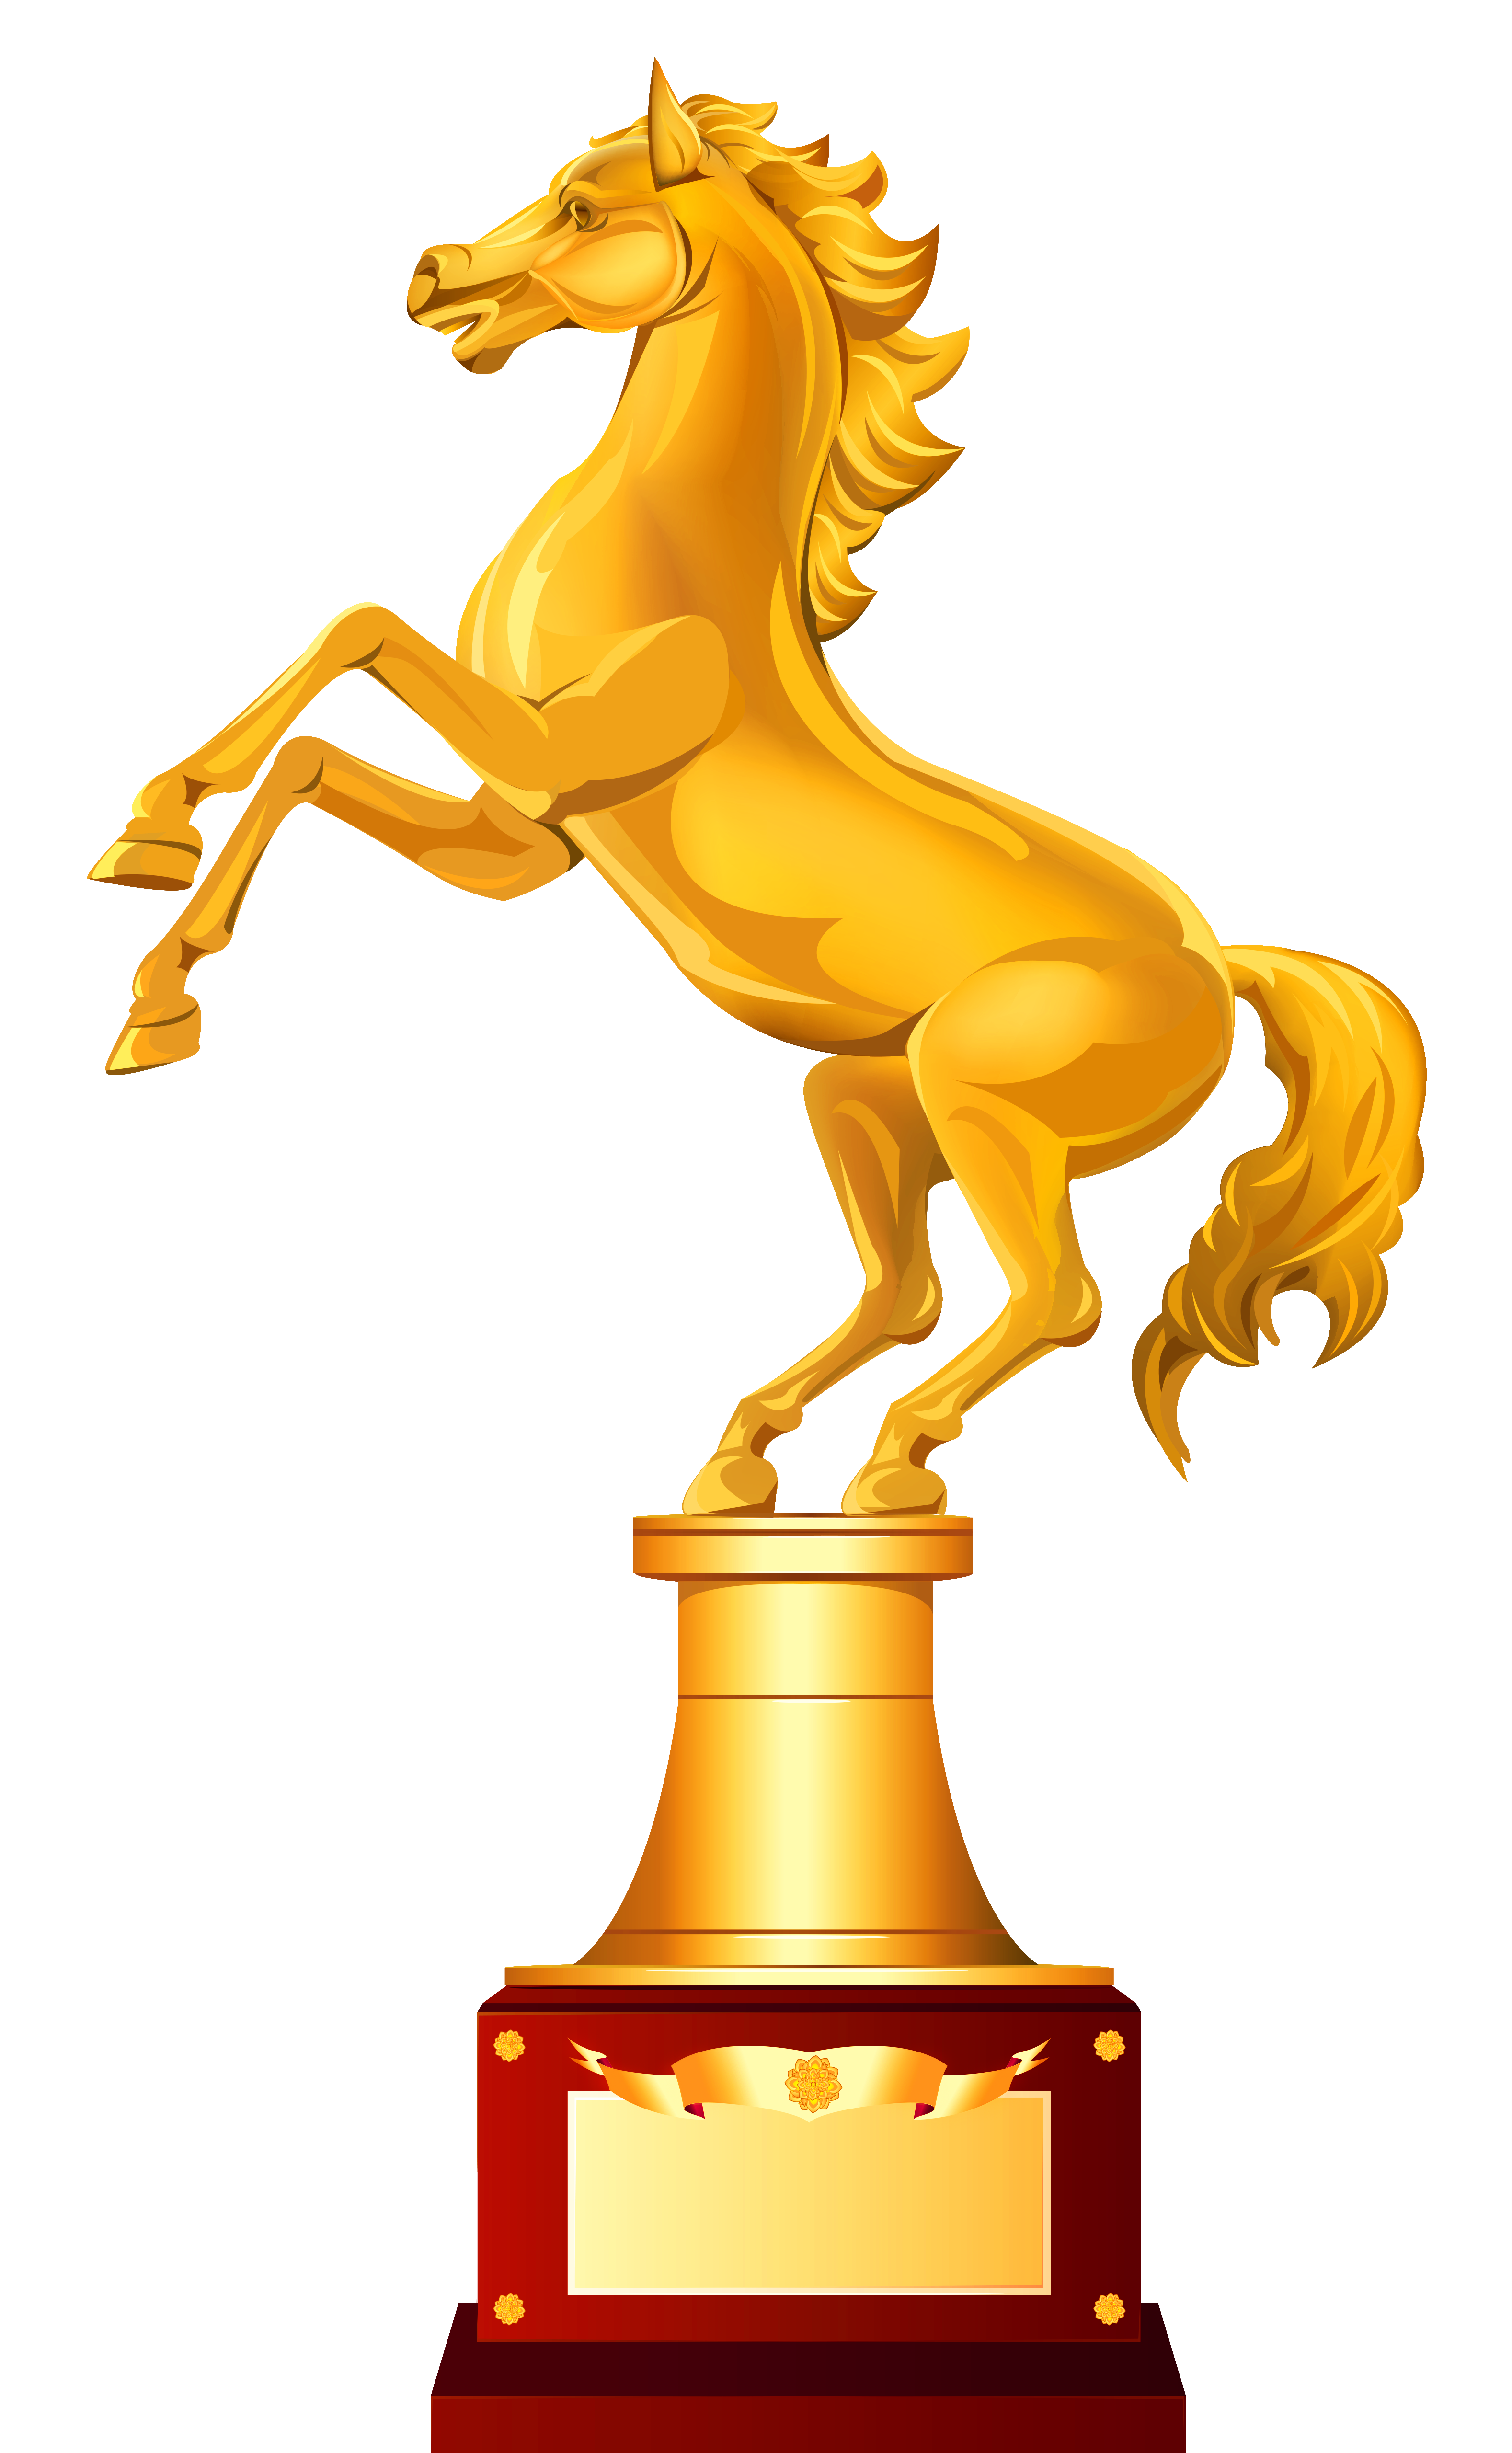 Clipart gold star award transparent download Golden Horse Trophy PNG Clipart Image | Gallery Yopriceville - High ... transparent download